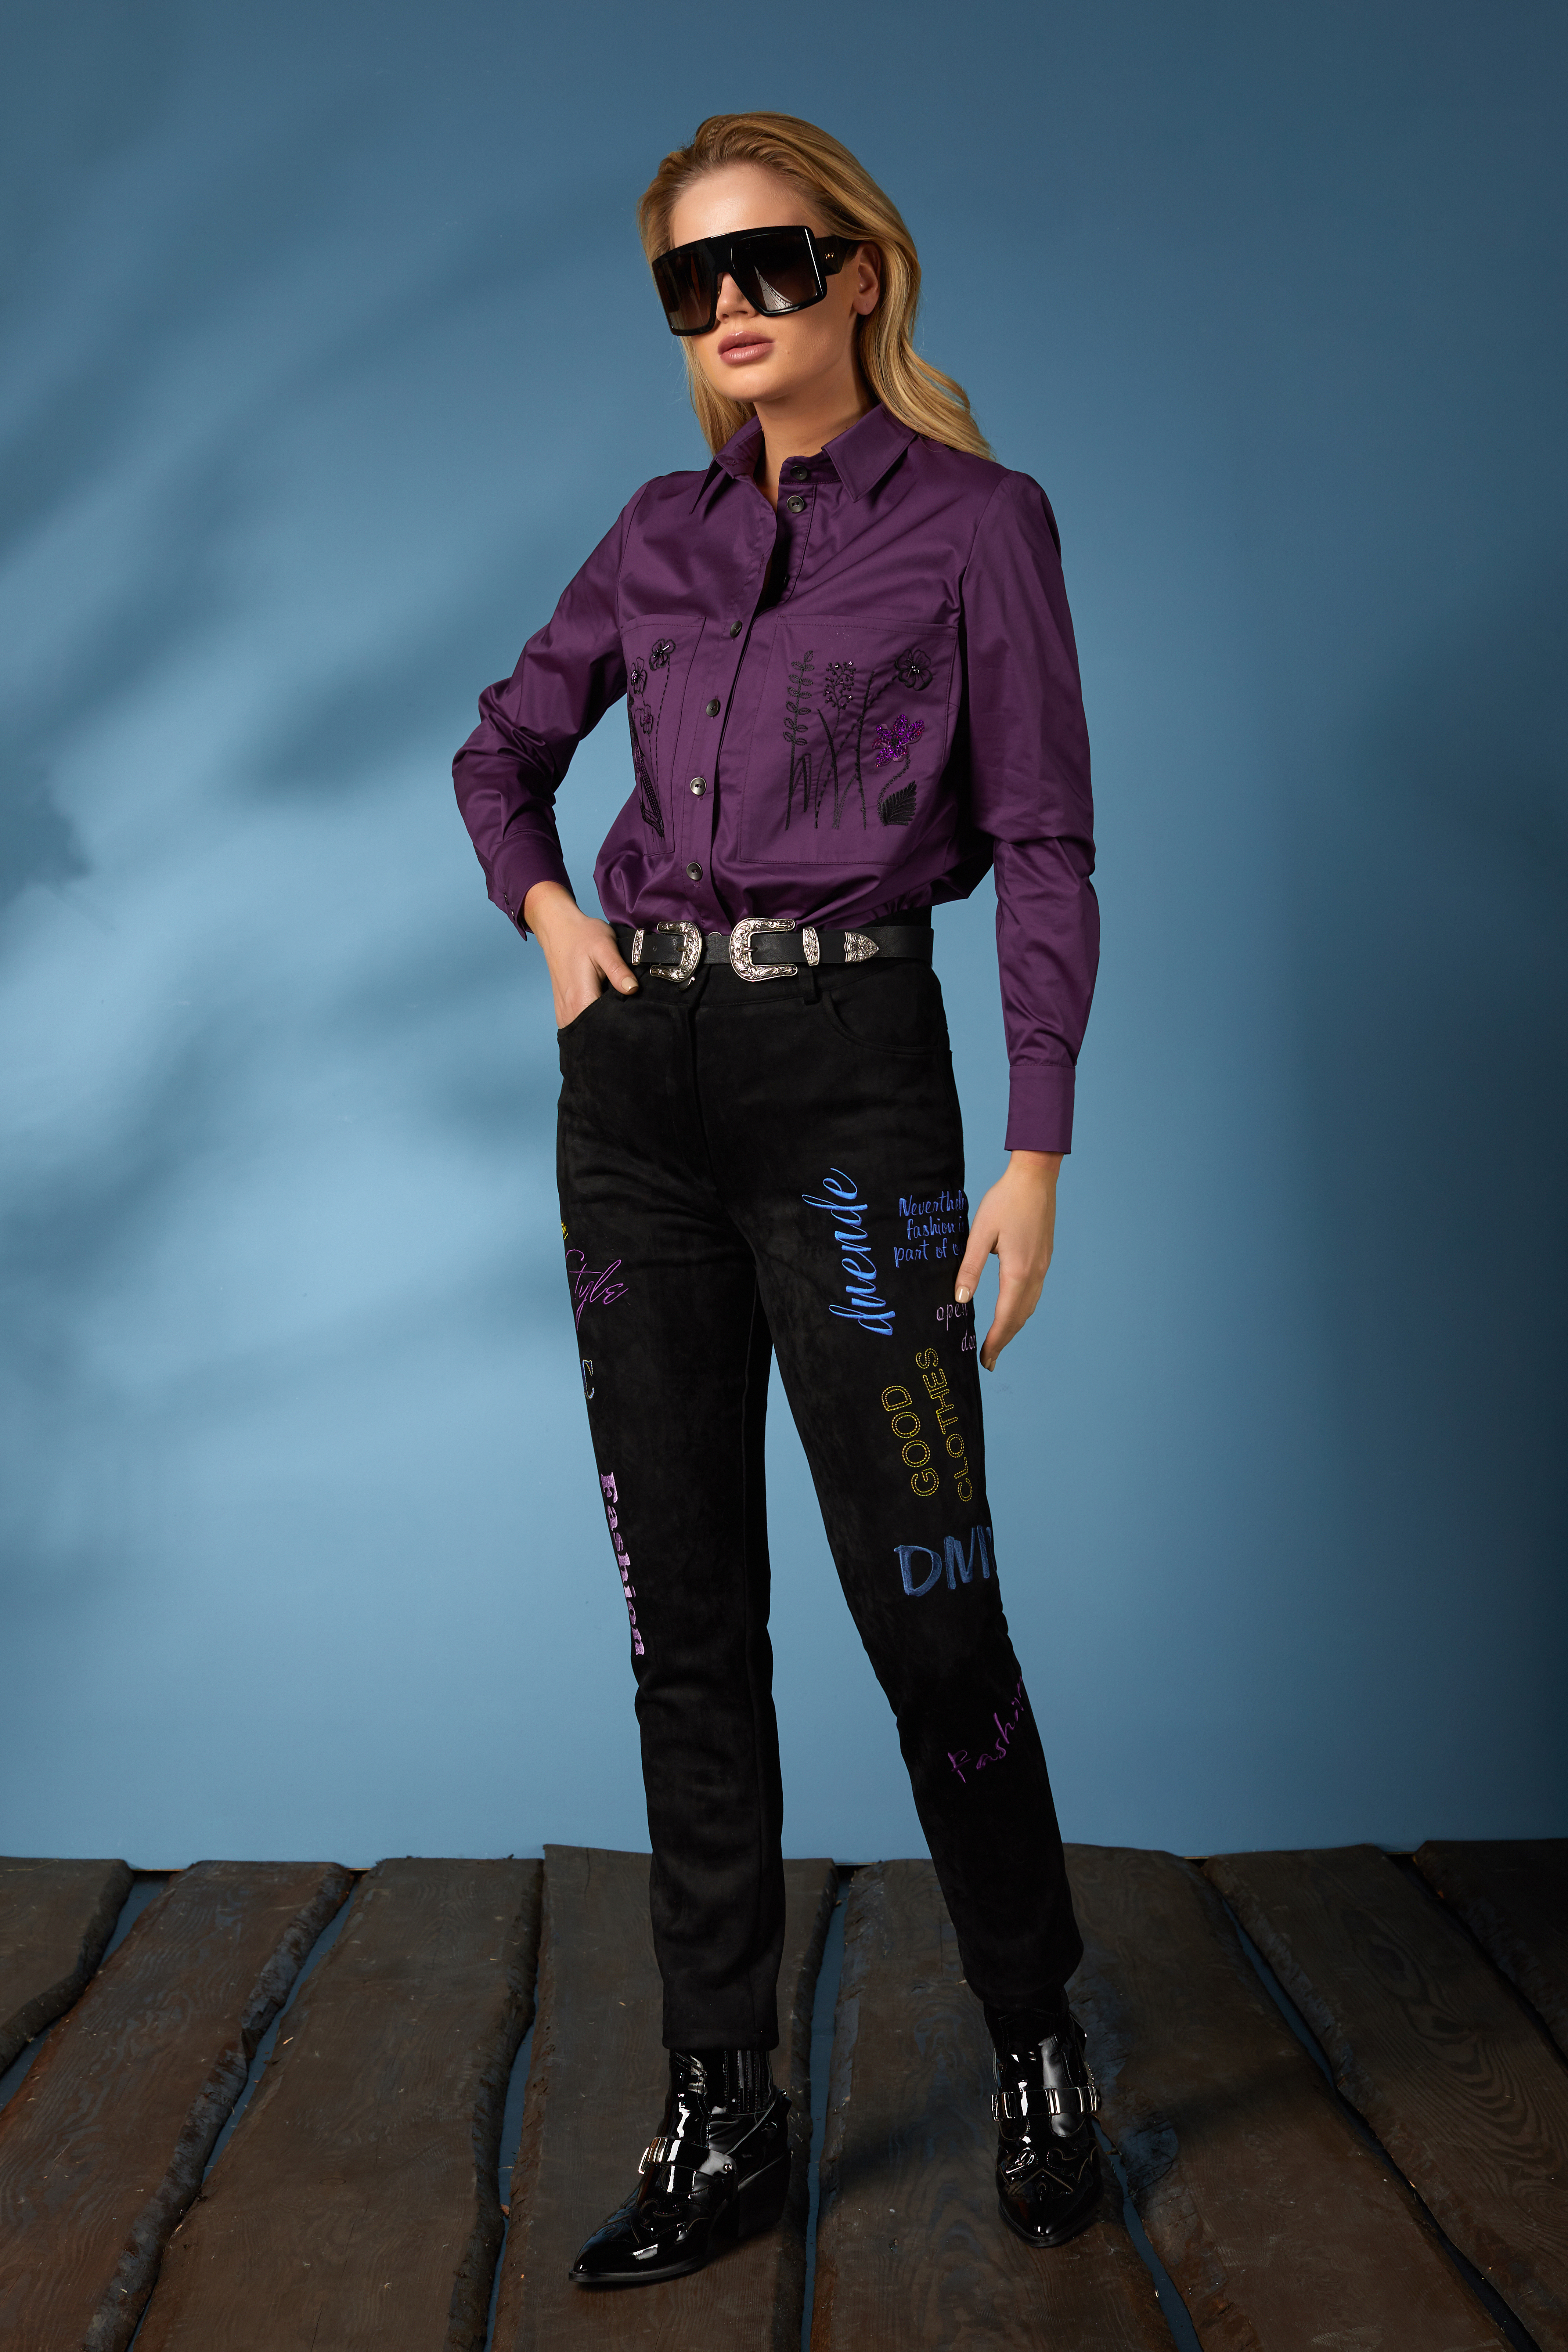 Рубашка 619-2, джинсы 631 (7)